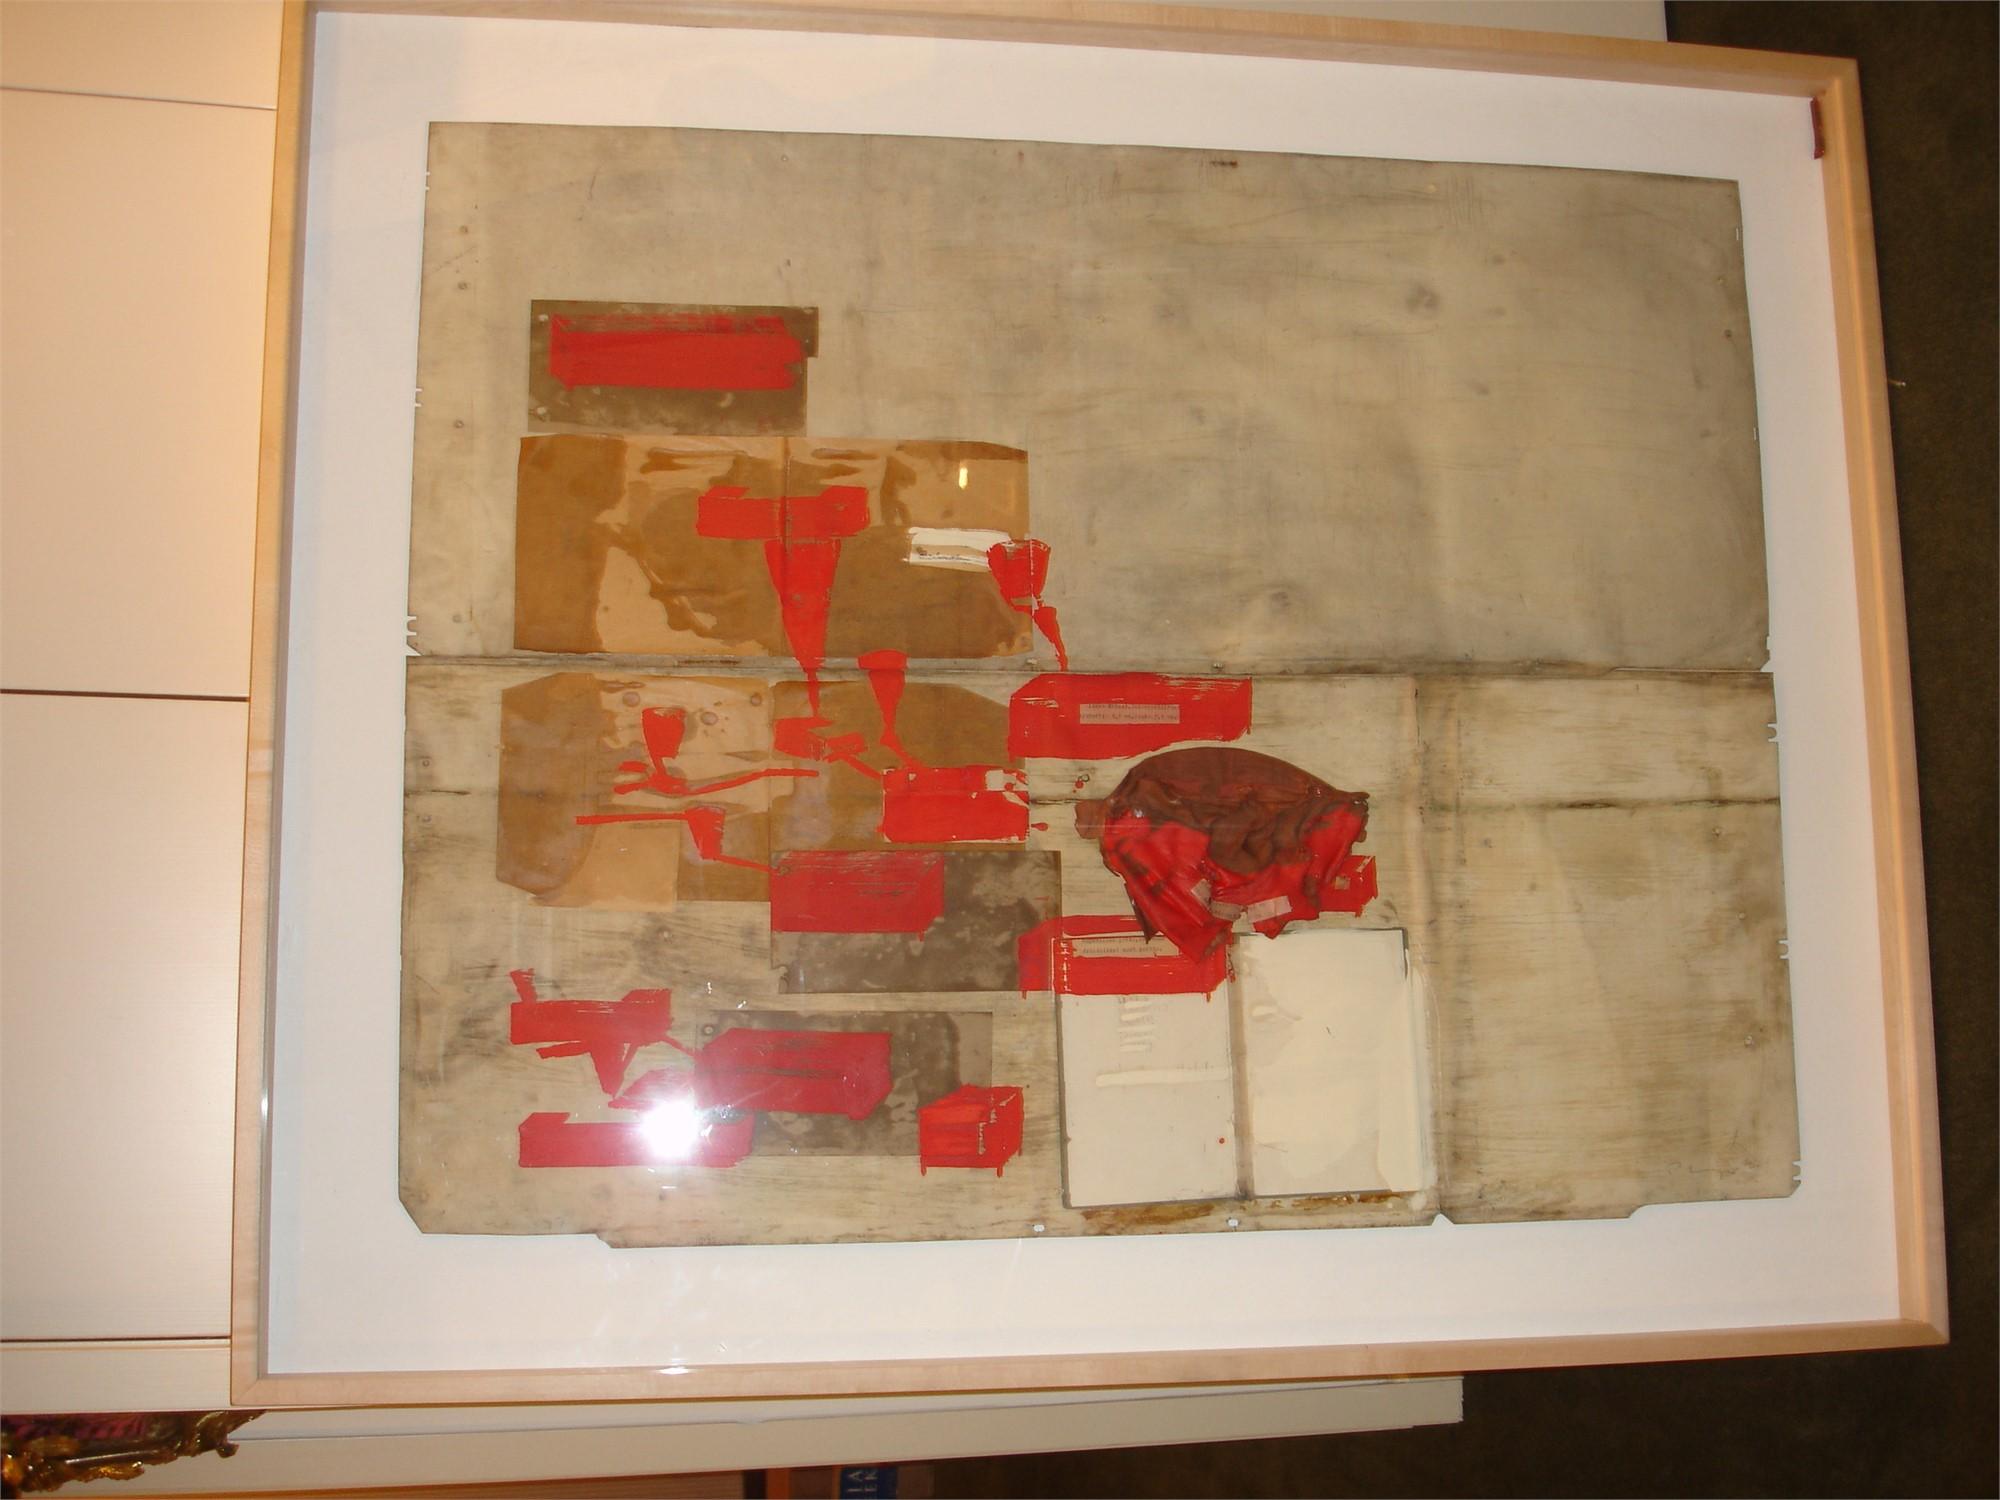 IM FLUSS DER ROTEN DINGE BY HEINZ (PETER) MAYER (AUSTRIAN, 1944-)